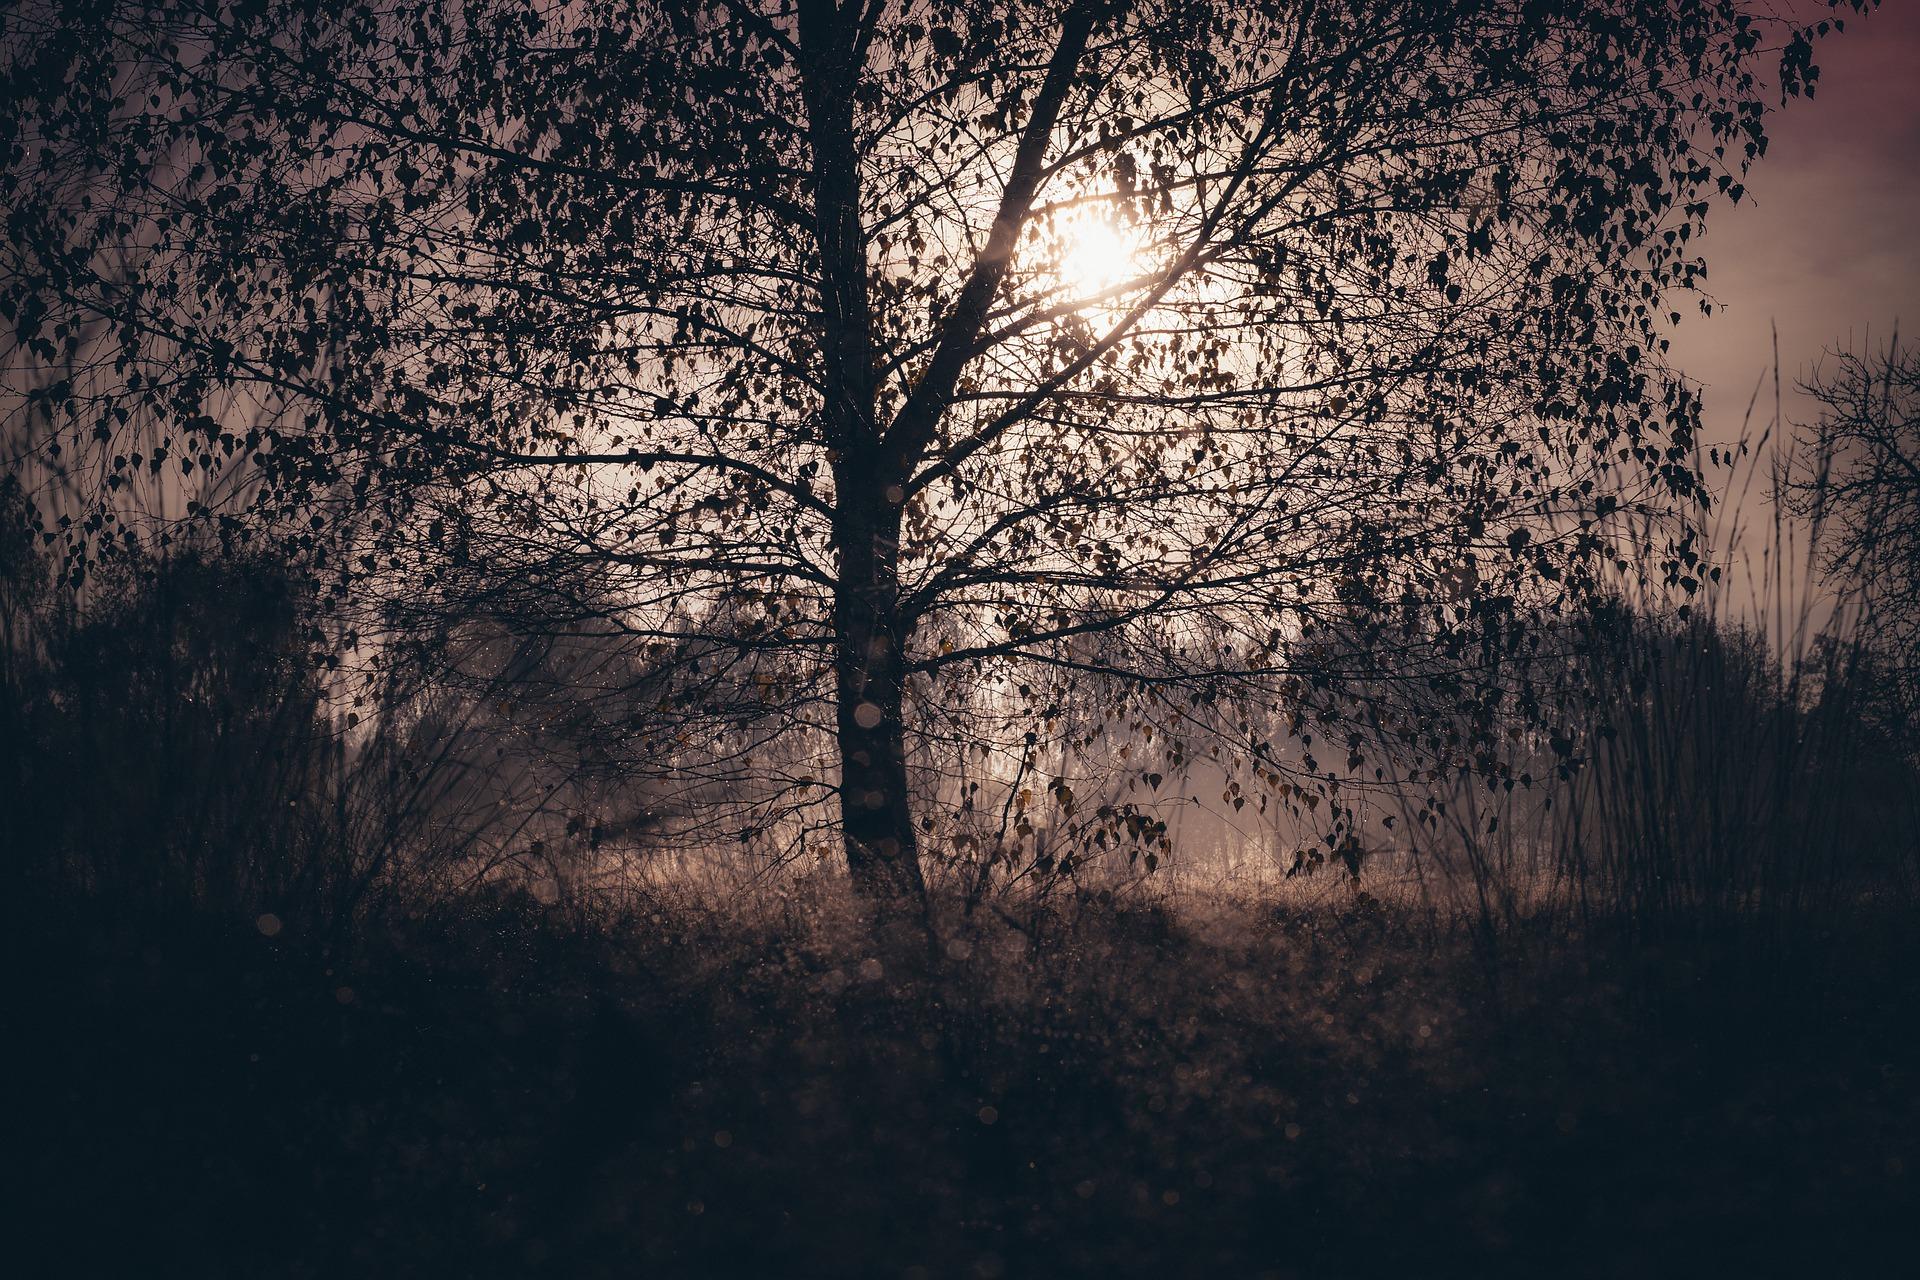 tree-4594095_1920